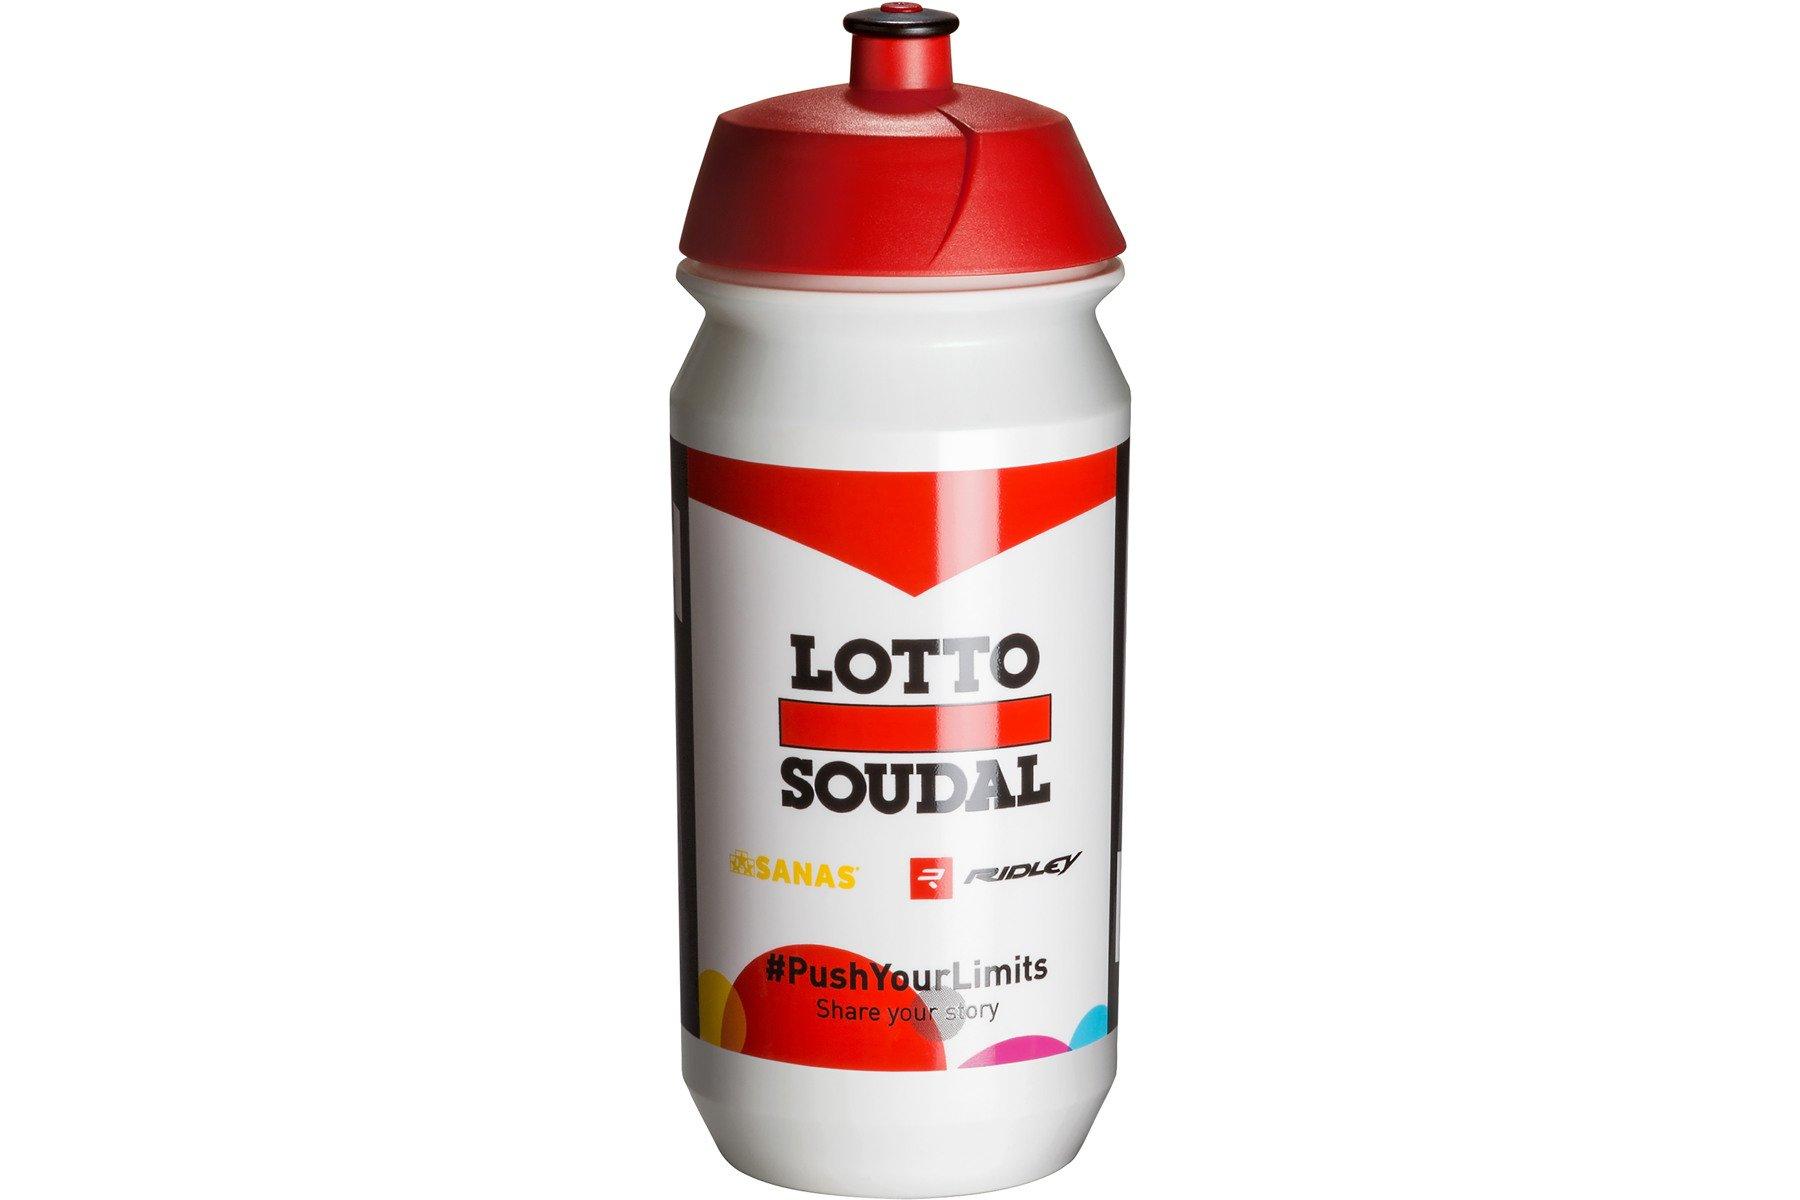 Tacx Lotto Soudal 2018 Flaske